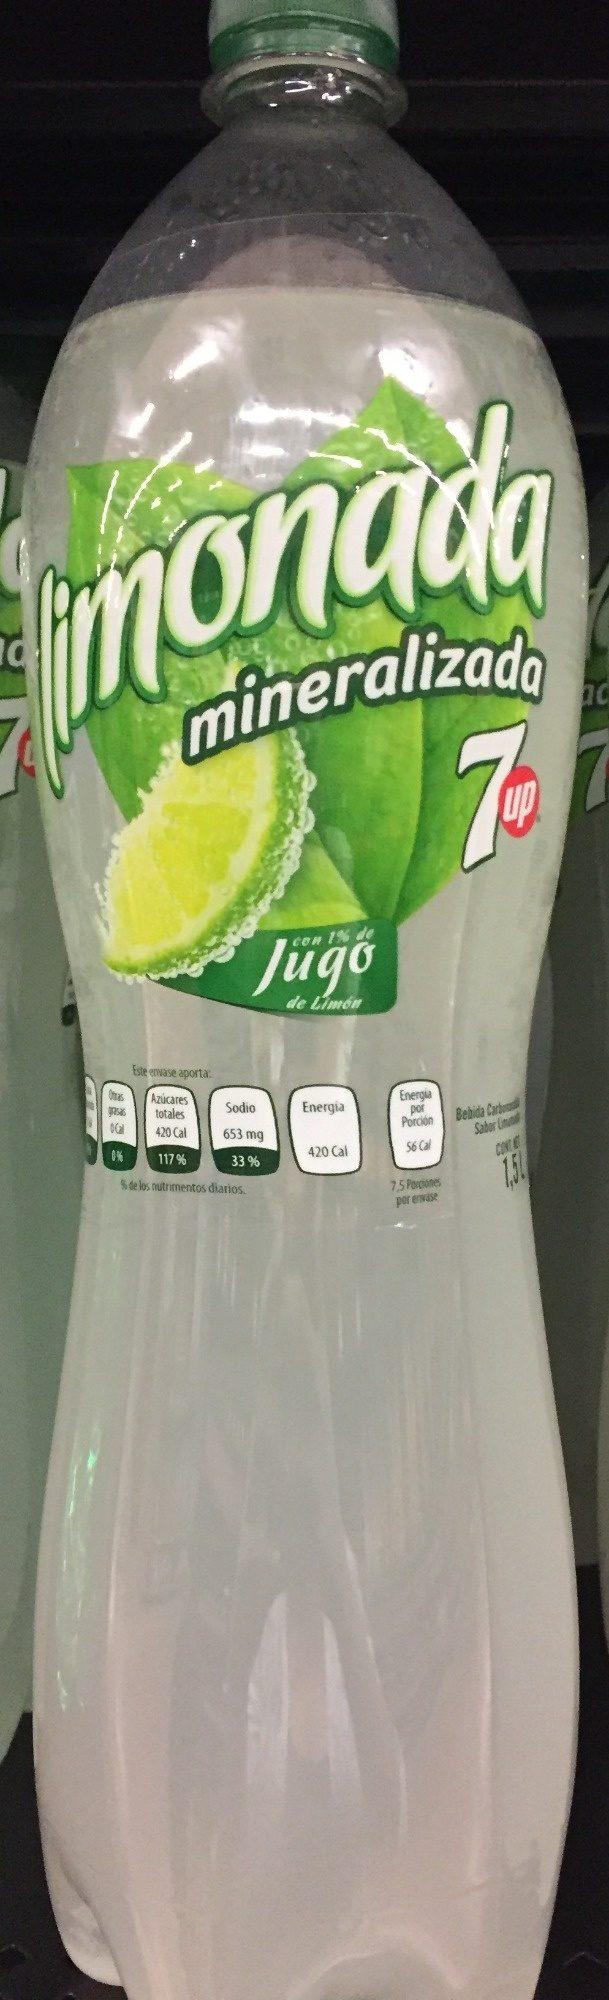 Limonada Mineralizada - Produit - es